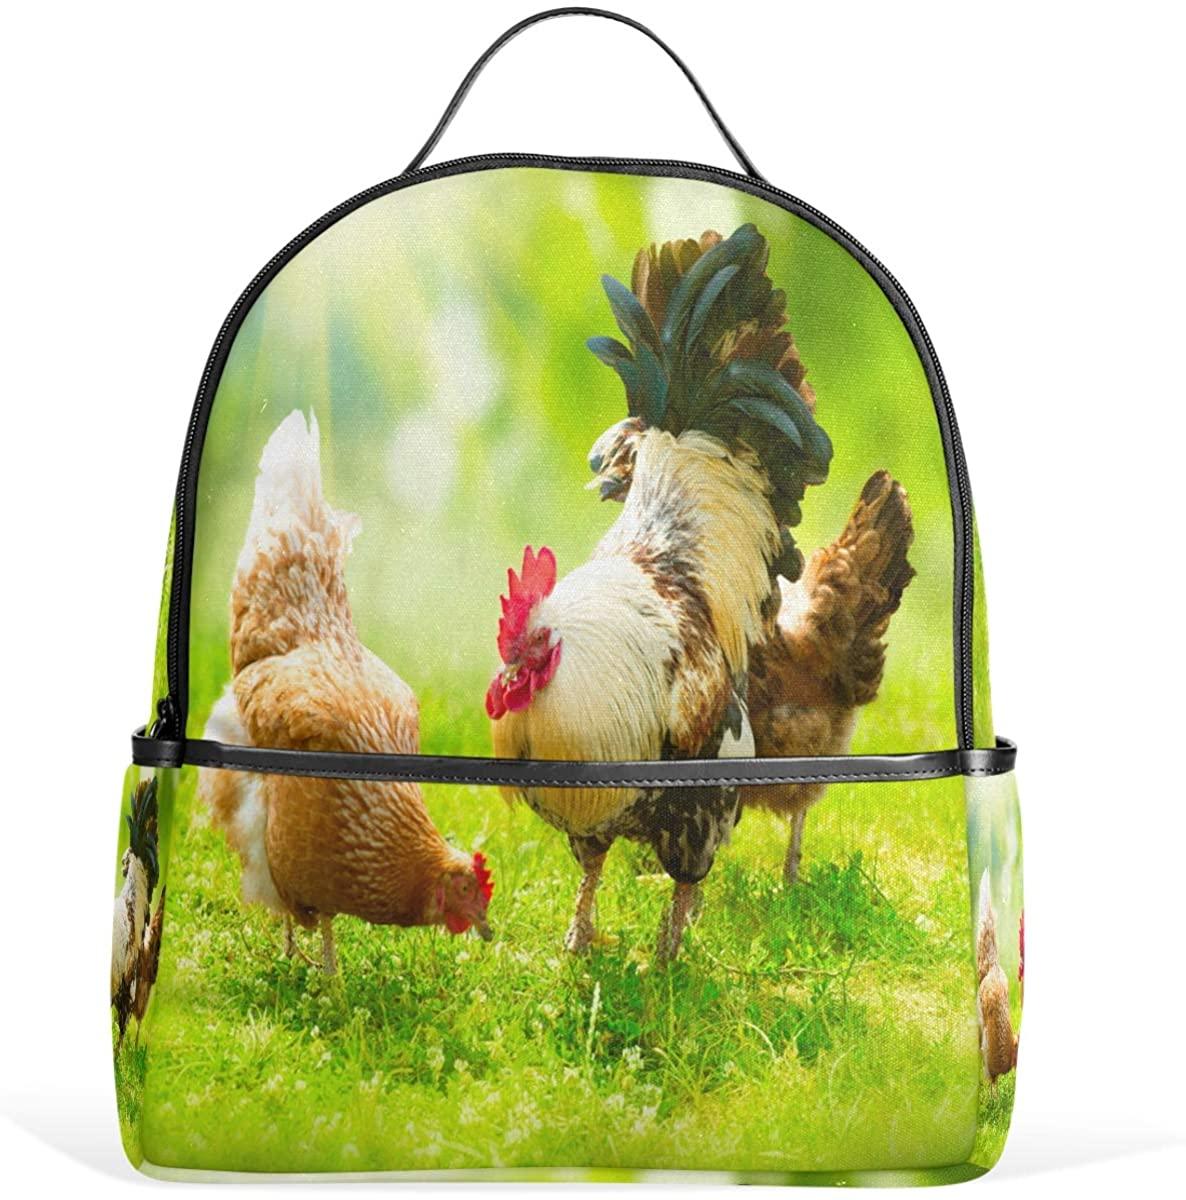 Olinyou Rooster Hens Farm Green Grass Cock Backpack School Book Bag Daypacks Shoulder Bags Rucksack for Boys Girls Students